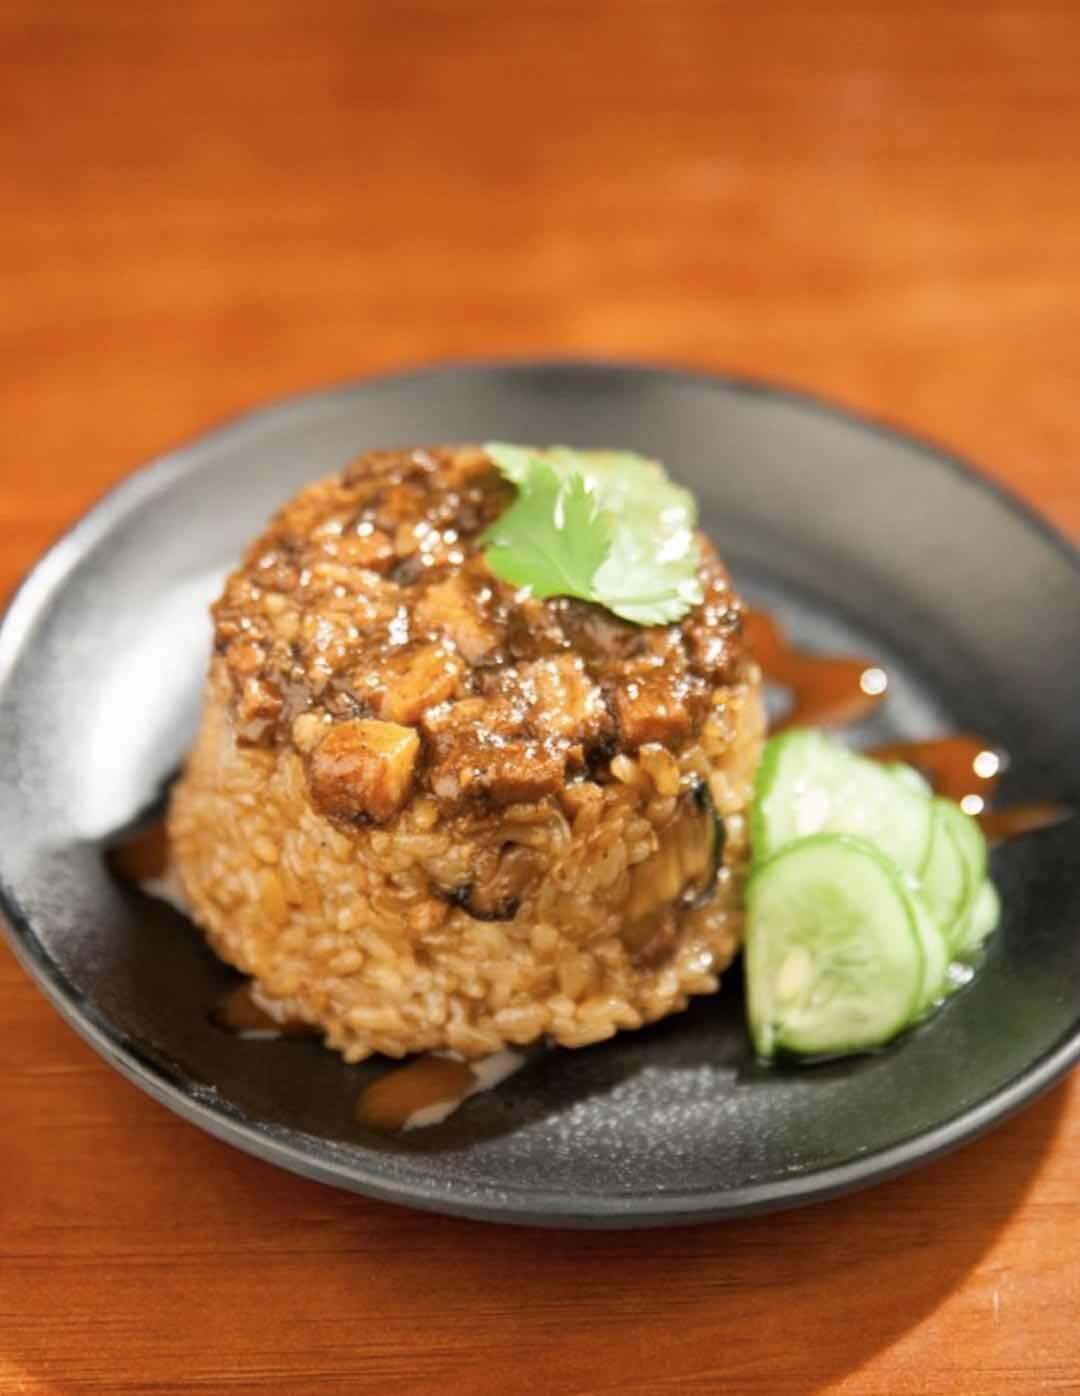 【Asia Blue】筒仔米糕 Minced Pork Glutinous Rice